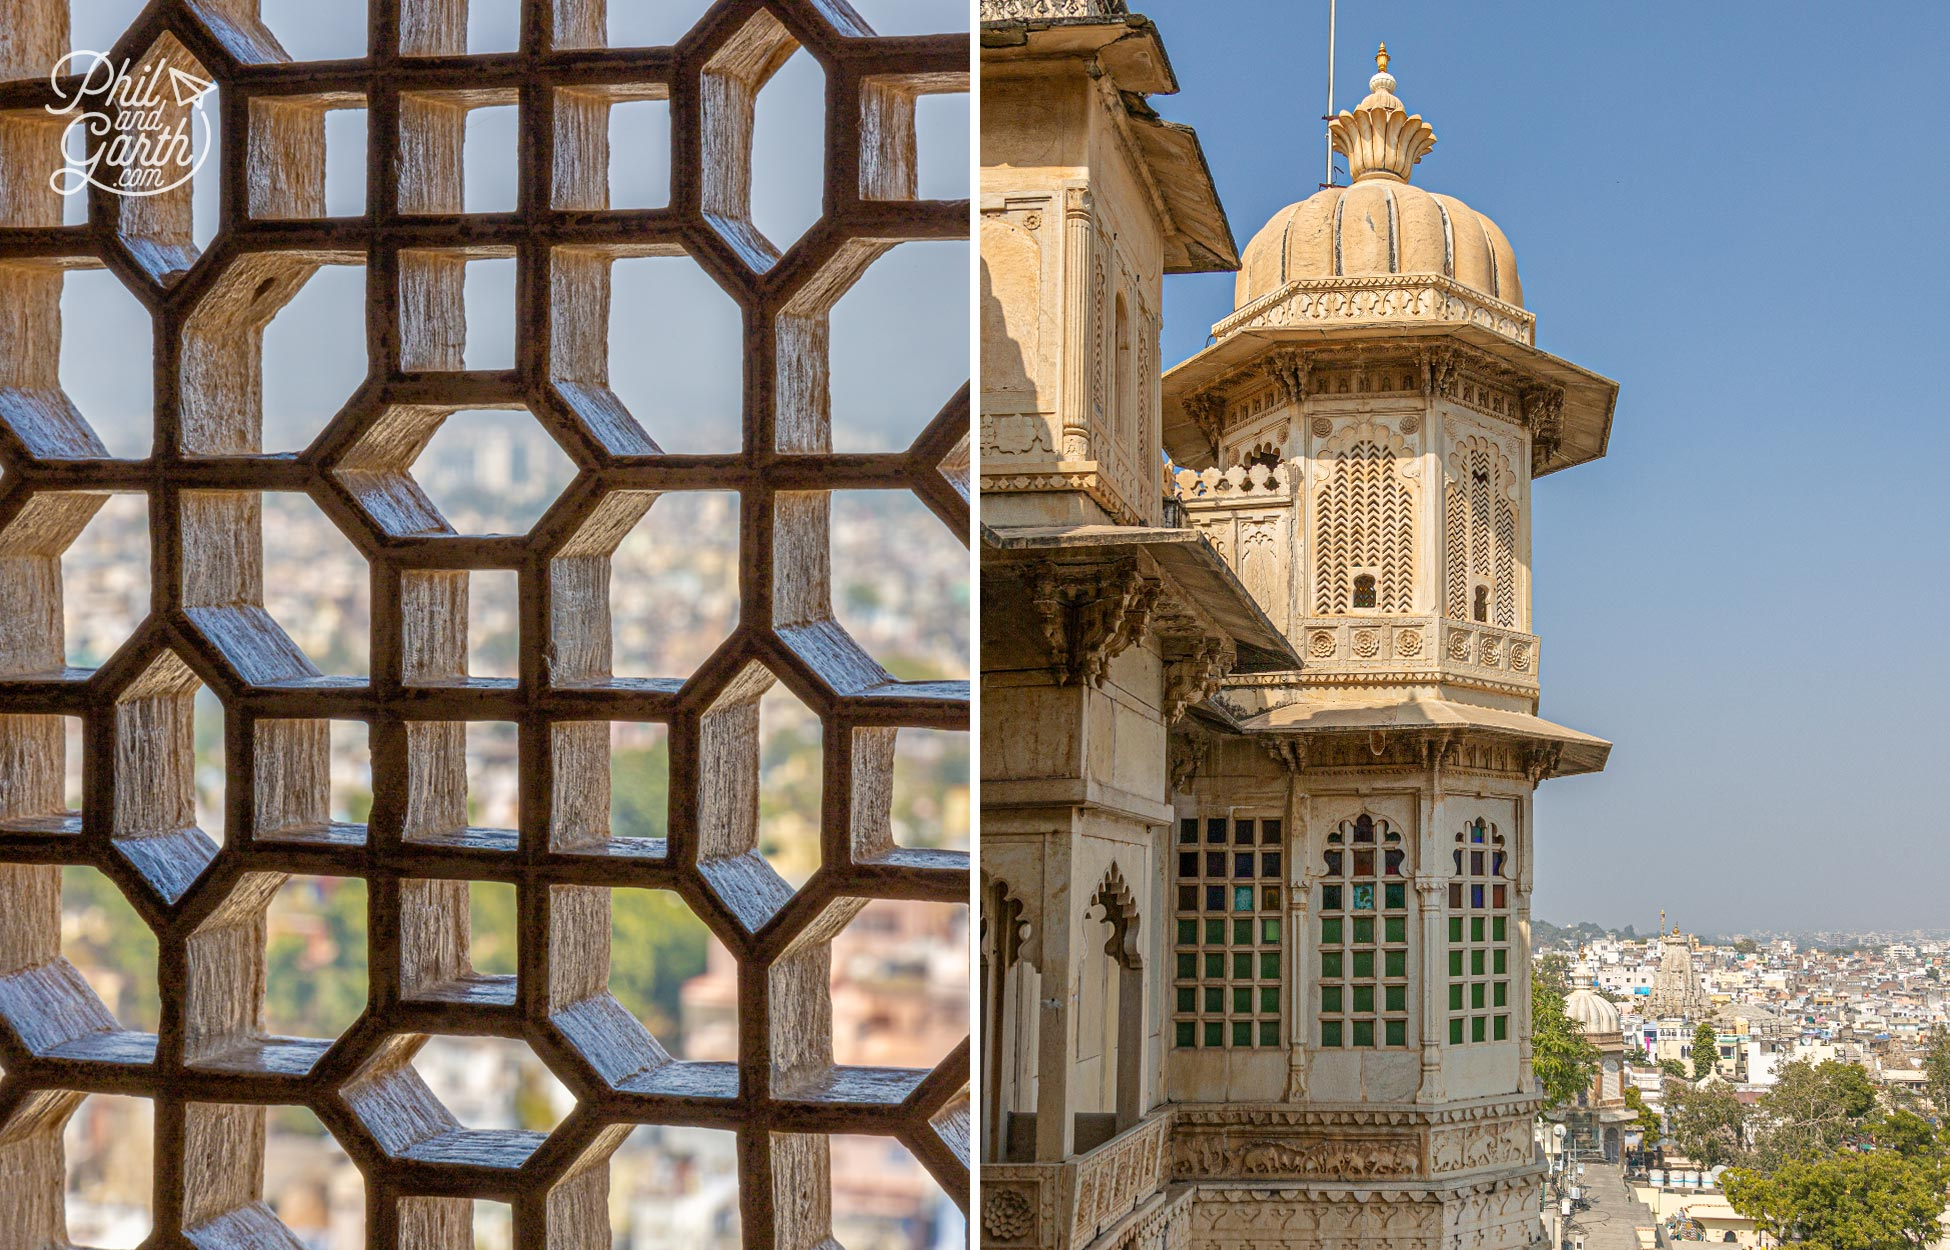 Window views from the Badi Mahal